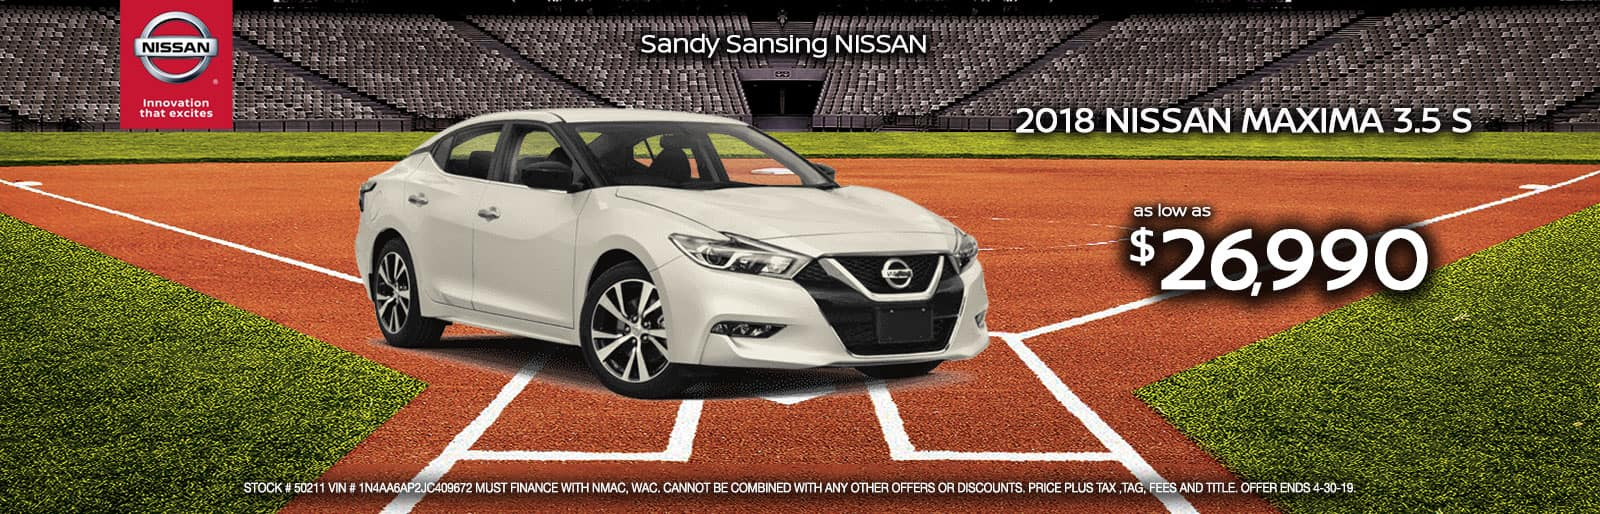 Sandy Sansing Nissan Pensacola FL Maxima